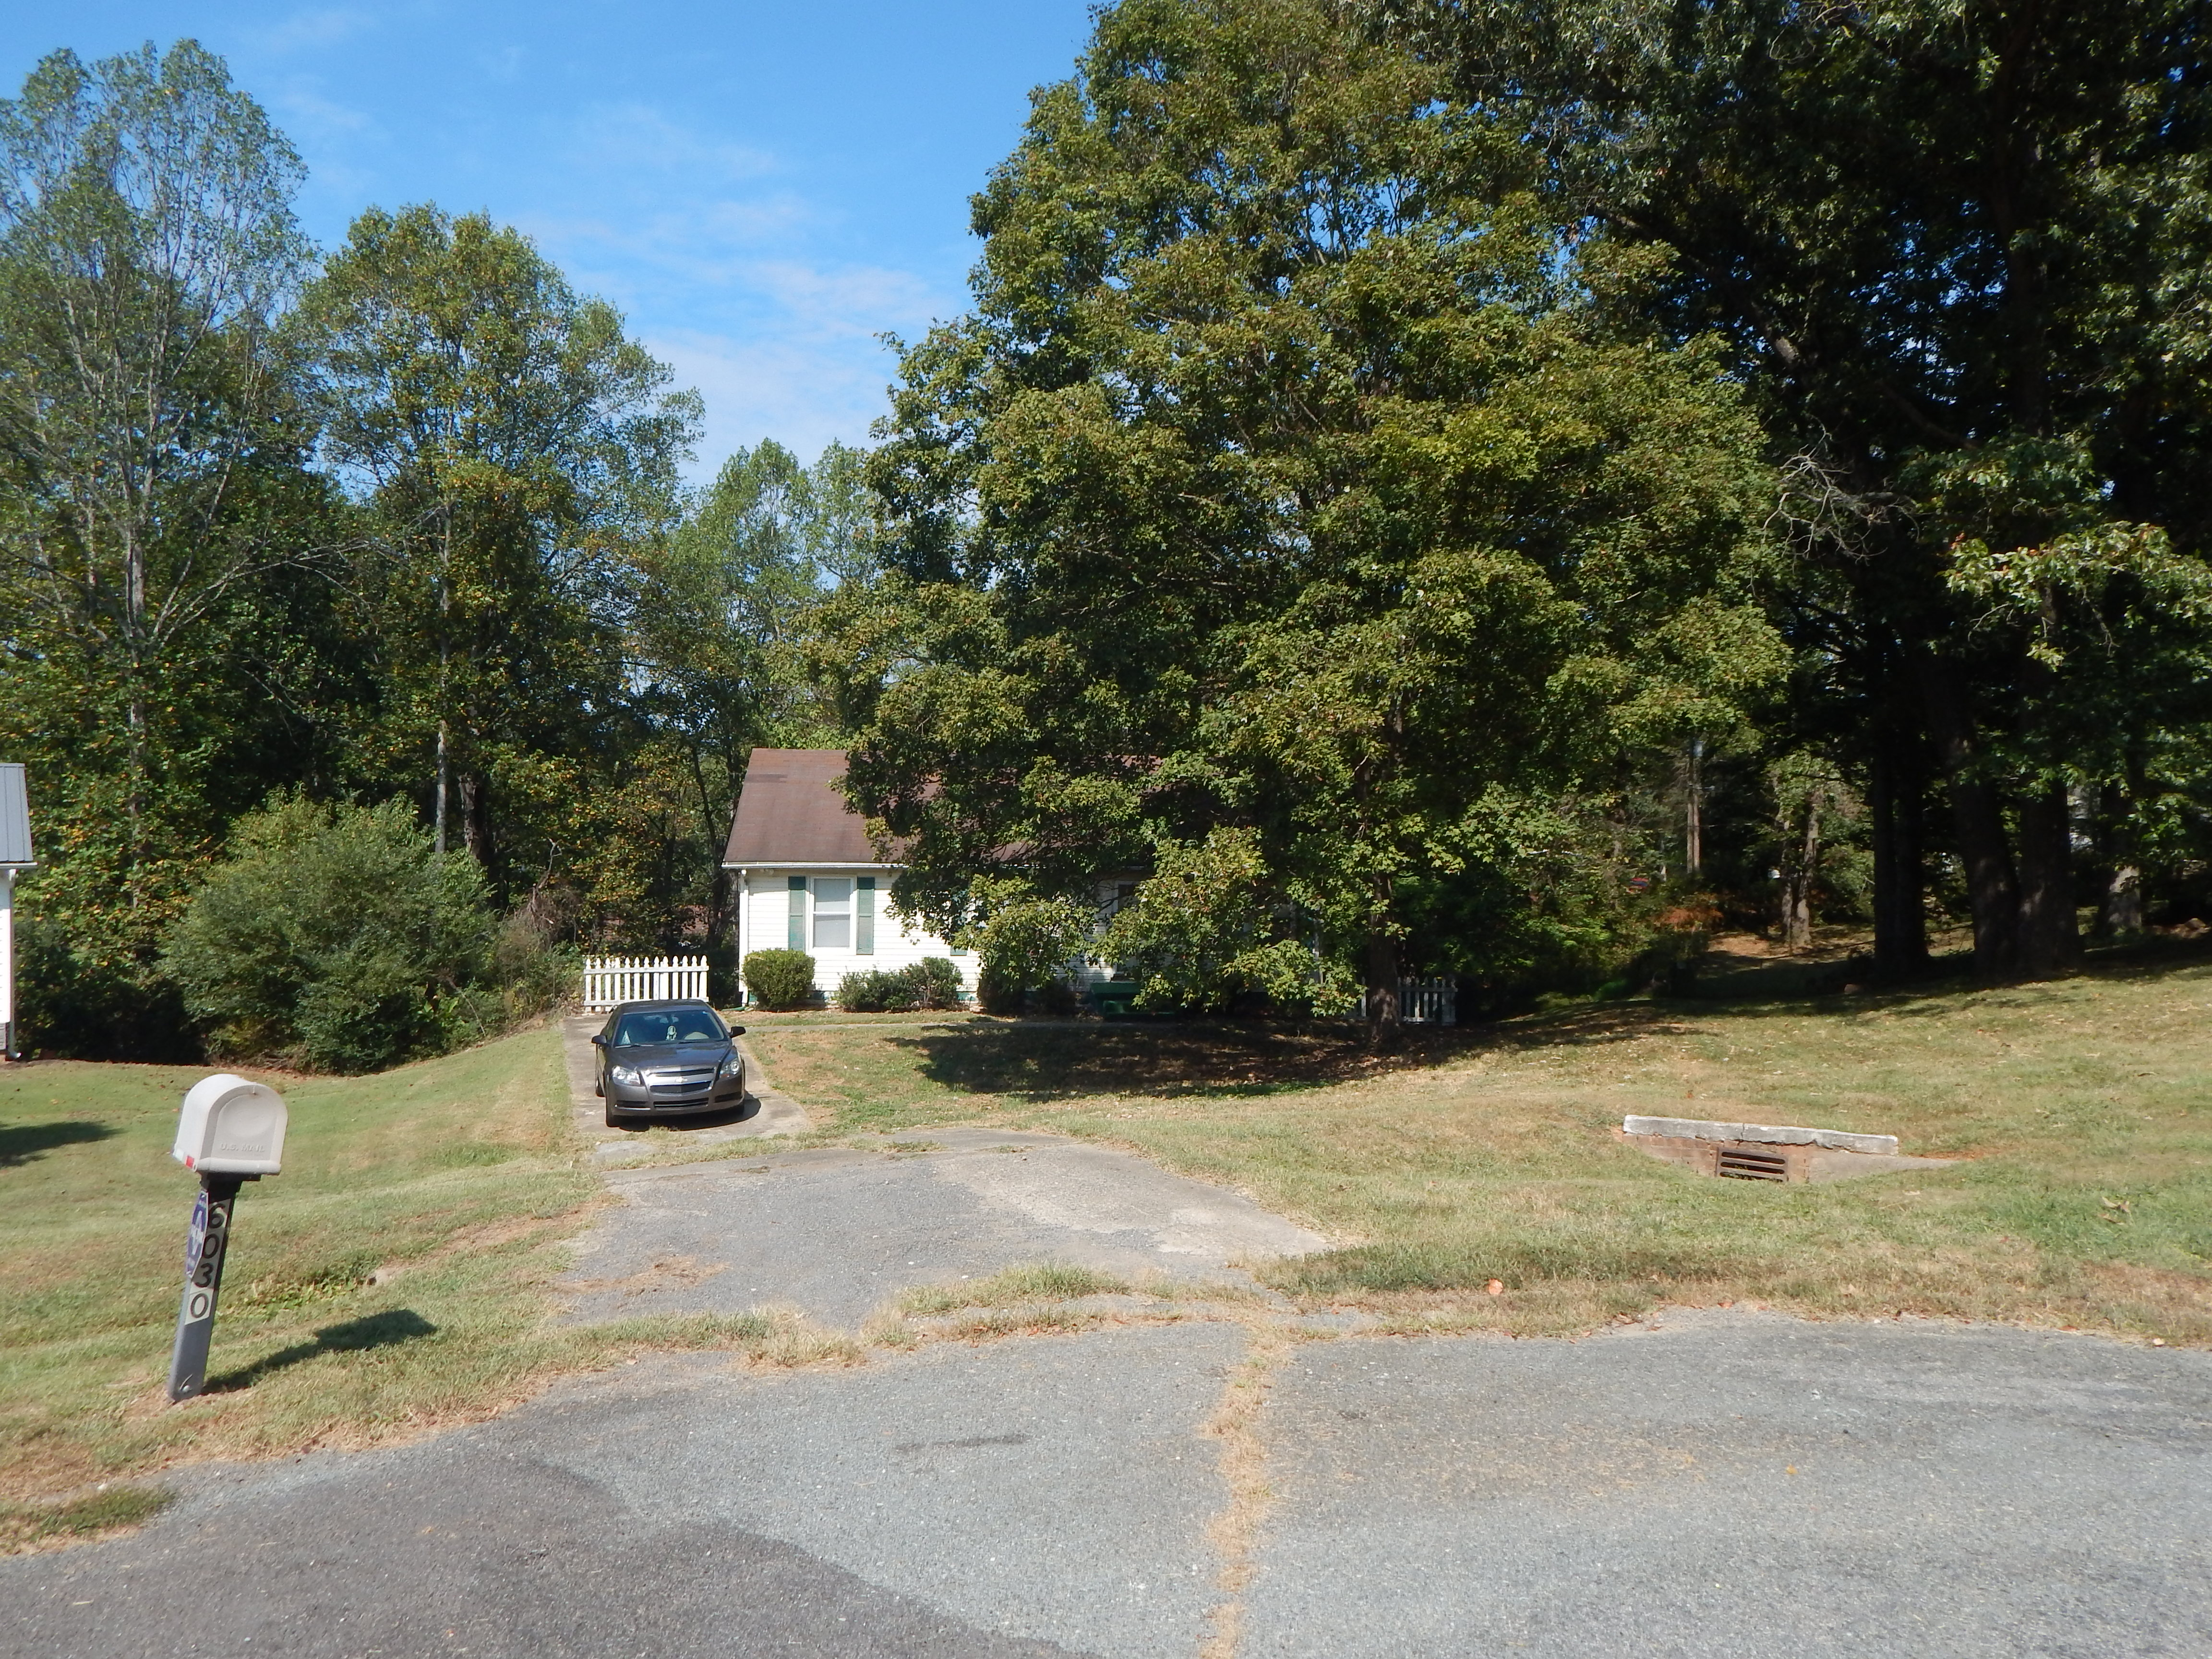 6030 Woodmont Ct (Image - 1)